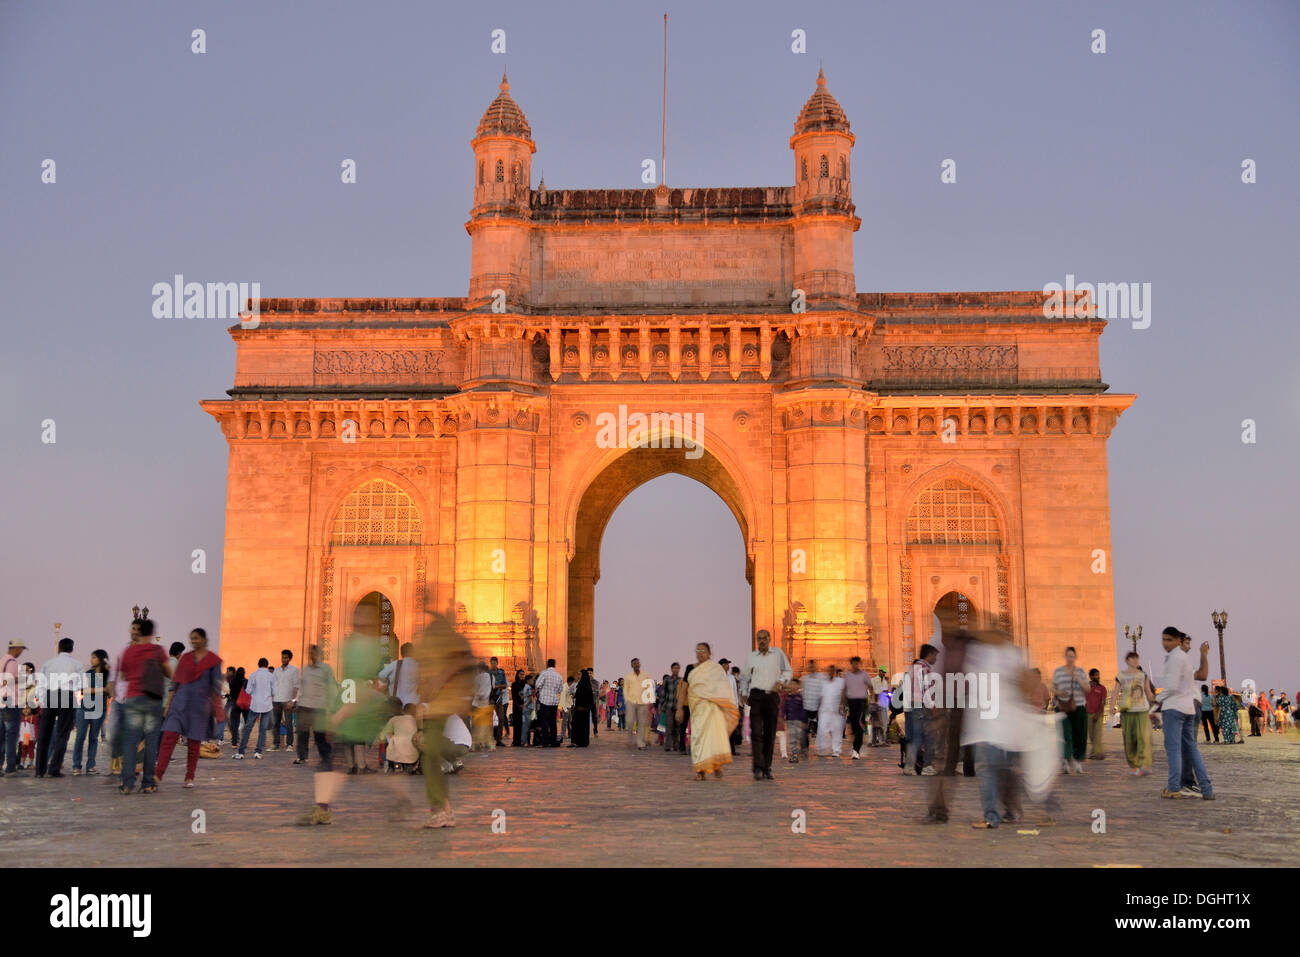 Puerta de la India, monumento emblemático de Mumbai, Mumbai, Maharashtra, India Imagen De Stock